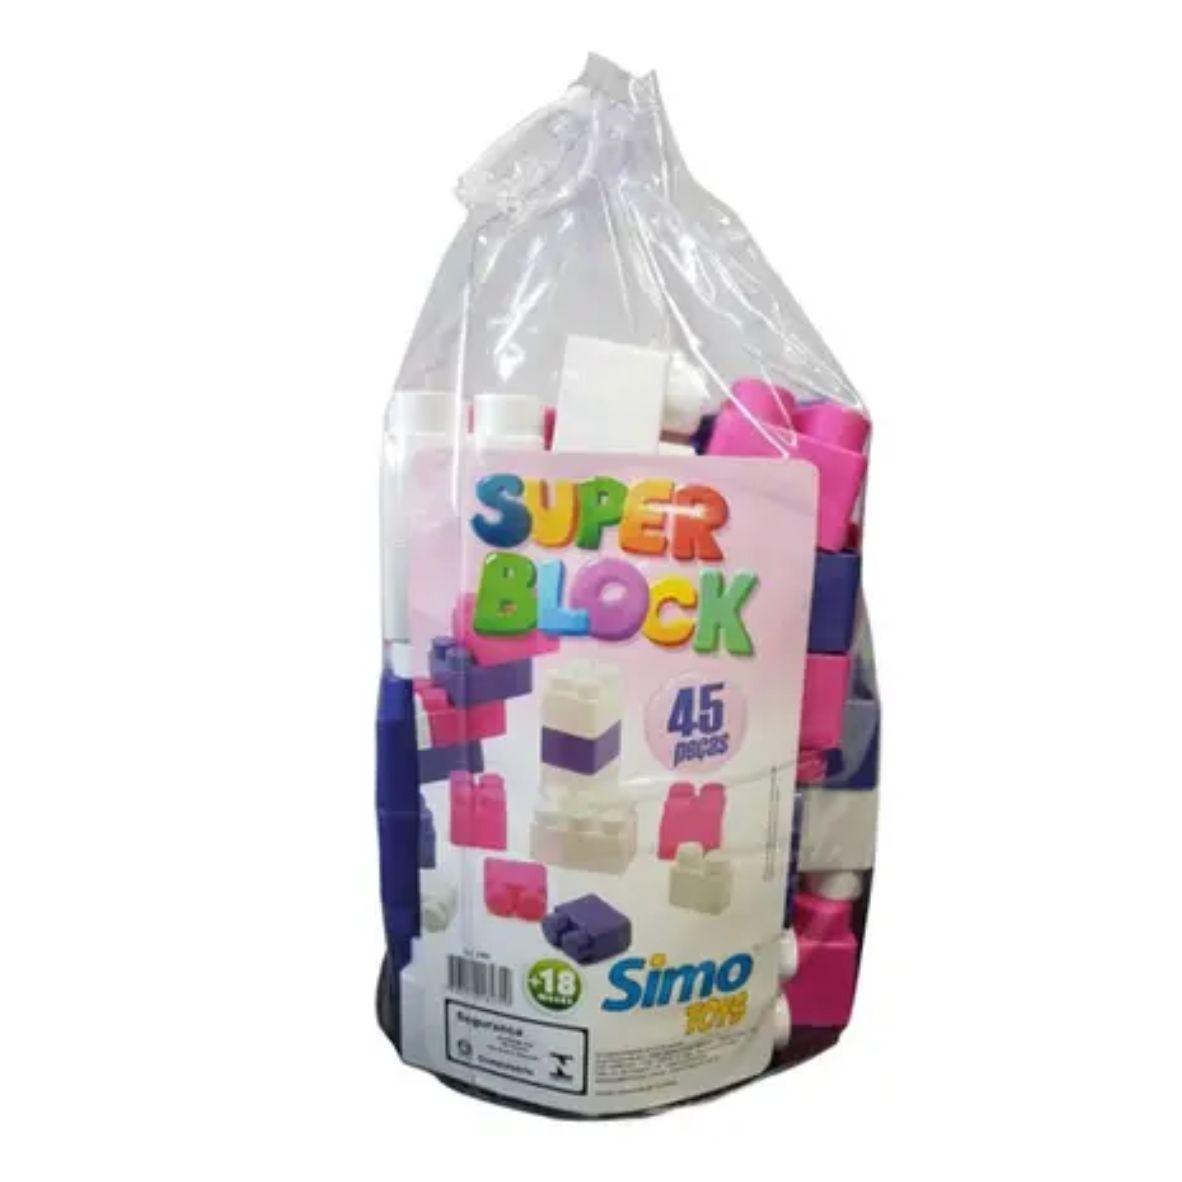 Blocos de Encaixe Super Block Menina - 45 Peças - Simo Toys